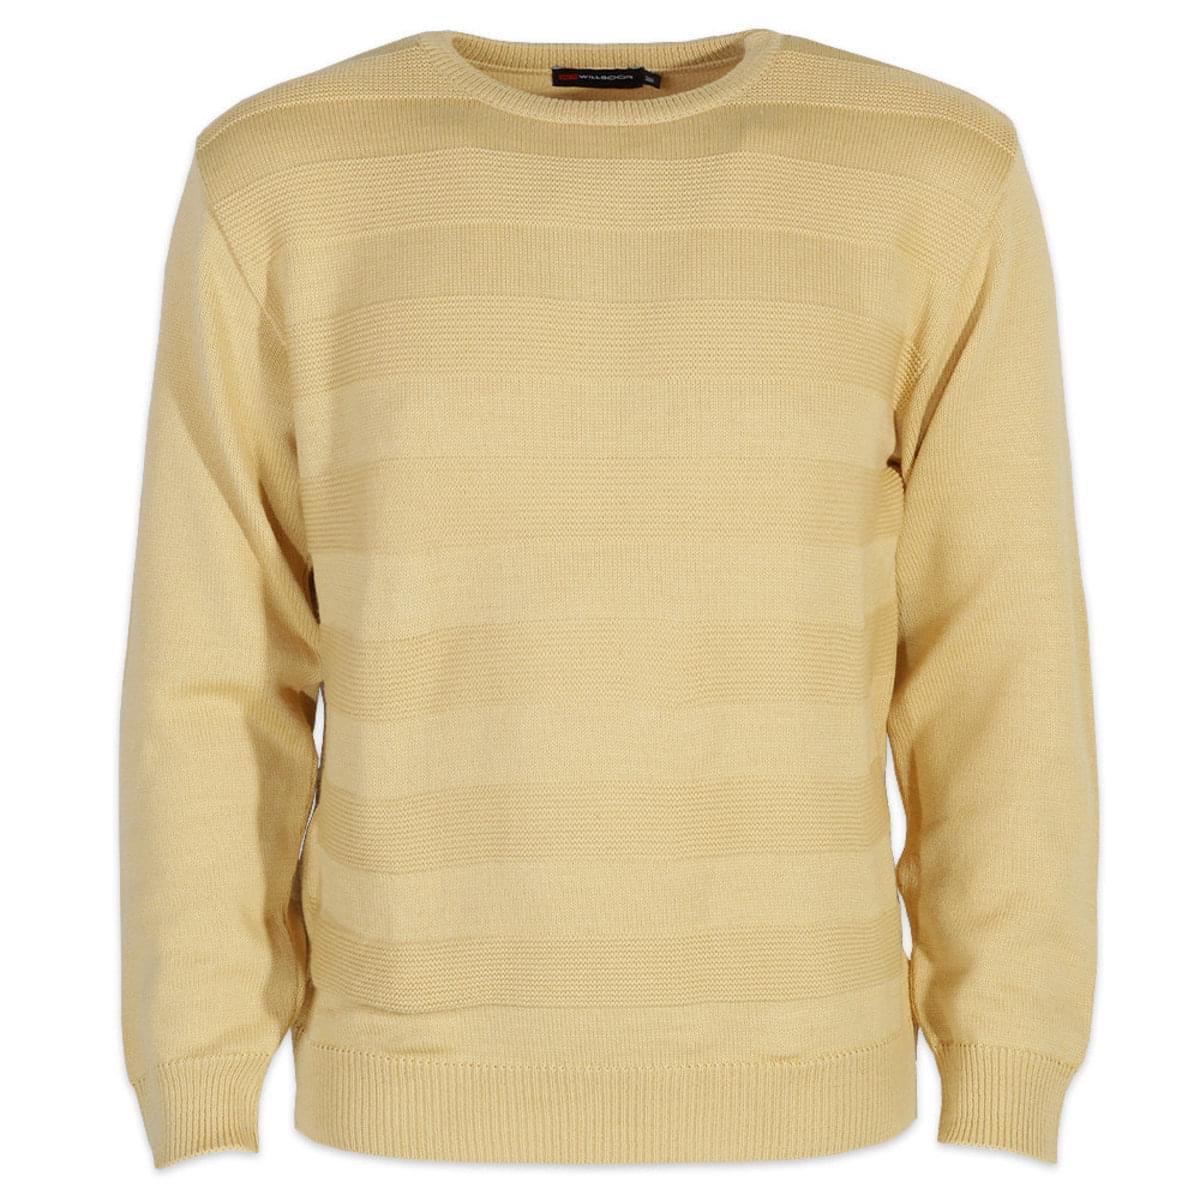 Pánský svetr Salvador 6487 ve žluté barvě L